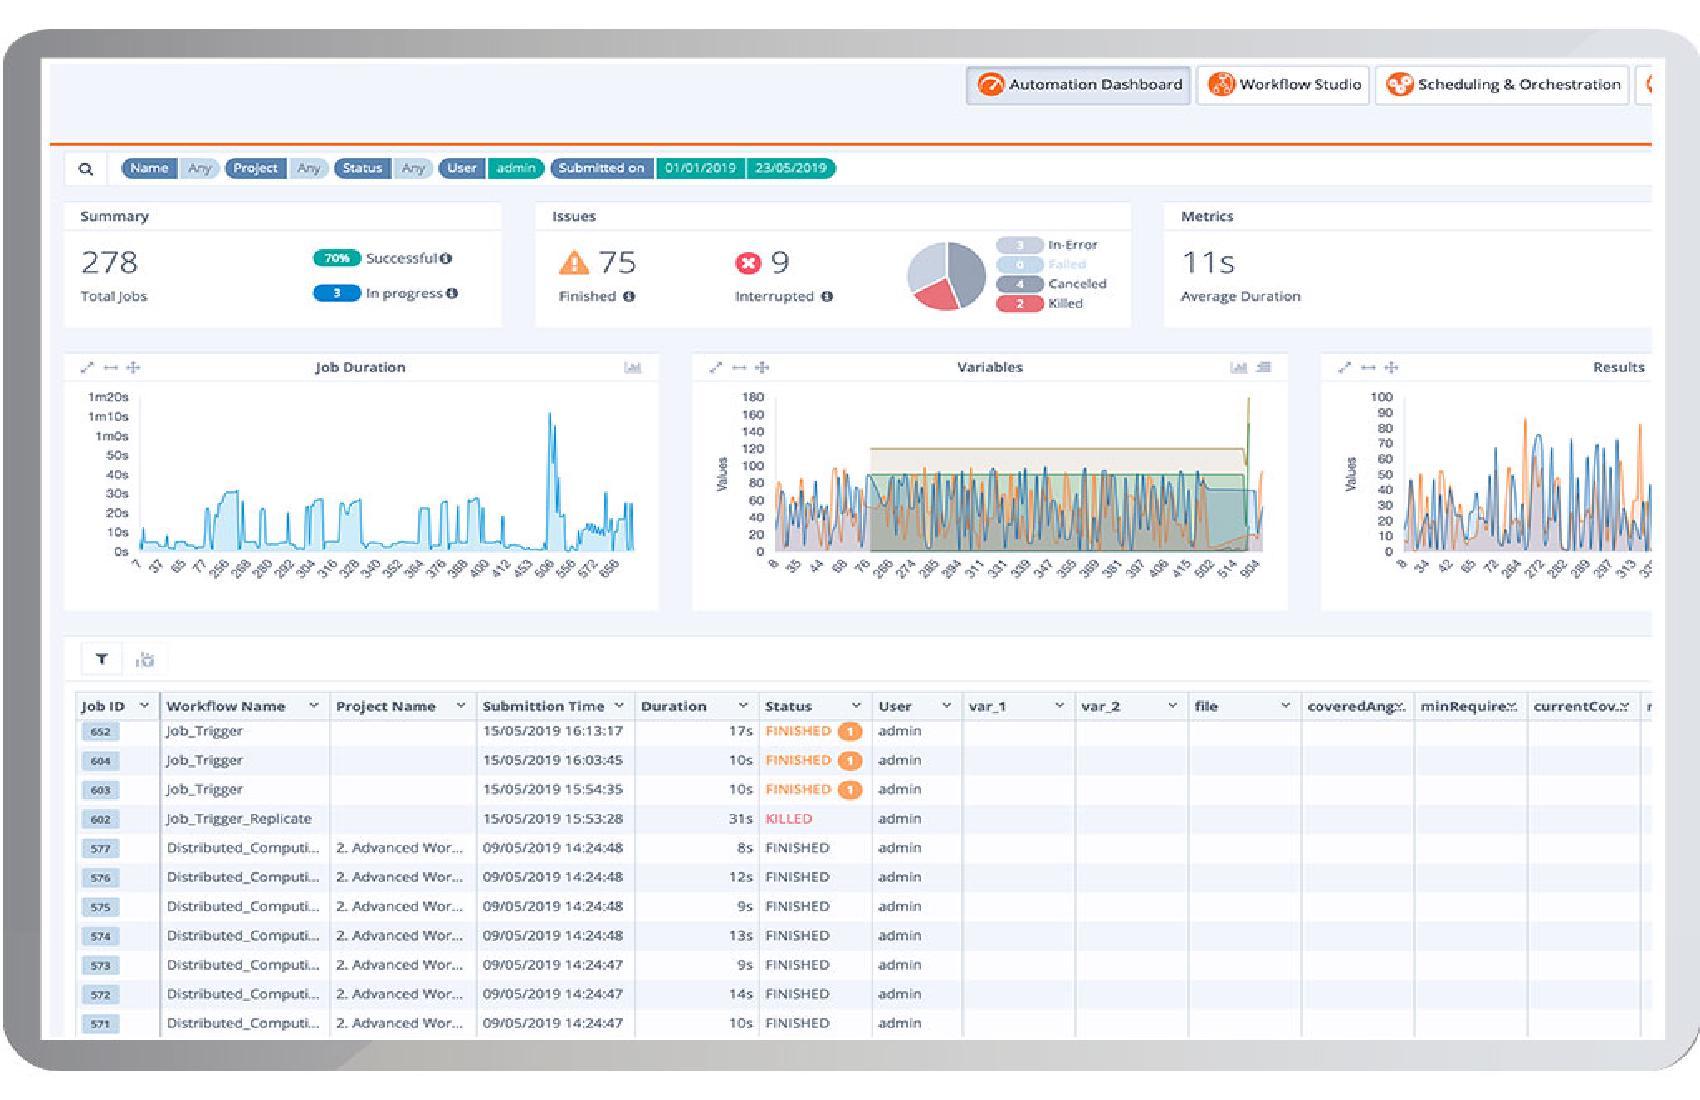 images/product-screenshots/job-analytics-frame.jpg